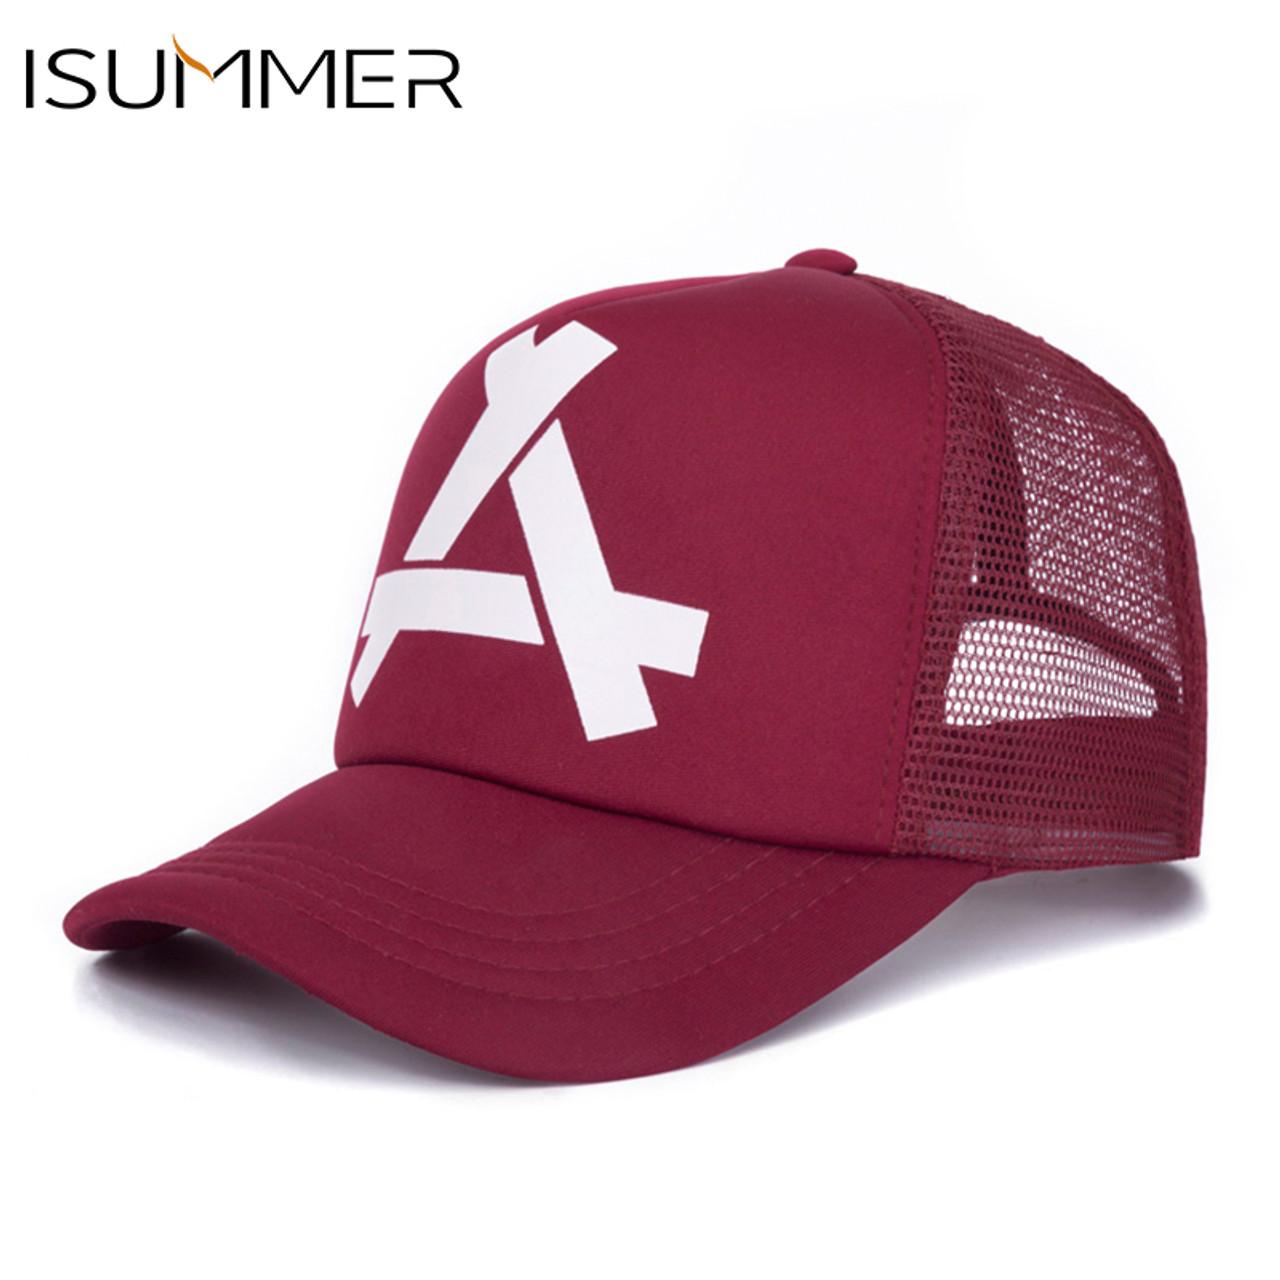 7570e31d94b17 ... ISUMMER 2018 Summer Baseball Mesh Cap Men Hat Hip Hop Snapback Hat Dad  Hat Adjustable Leisure ...